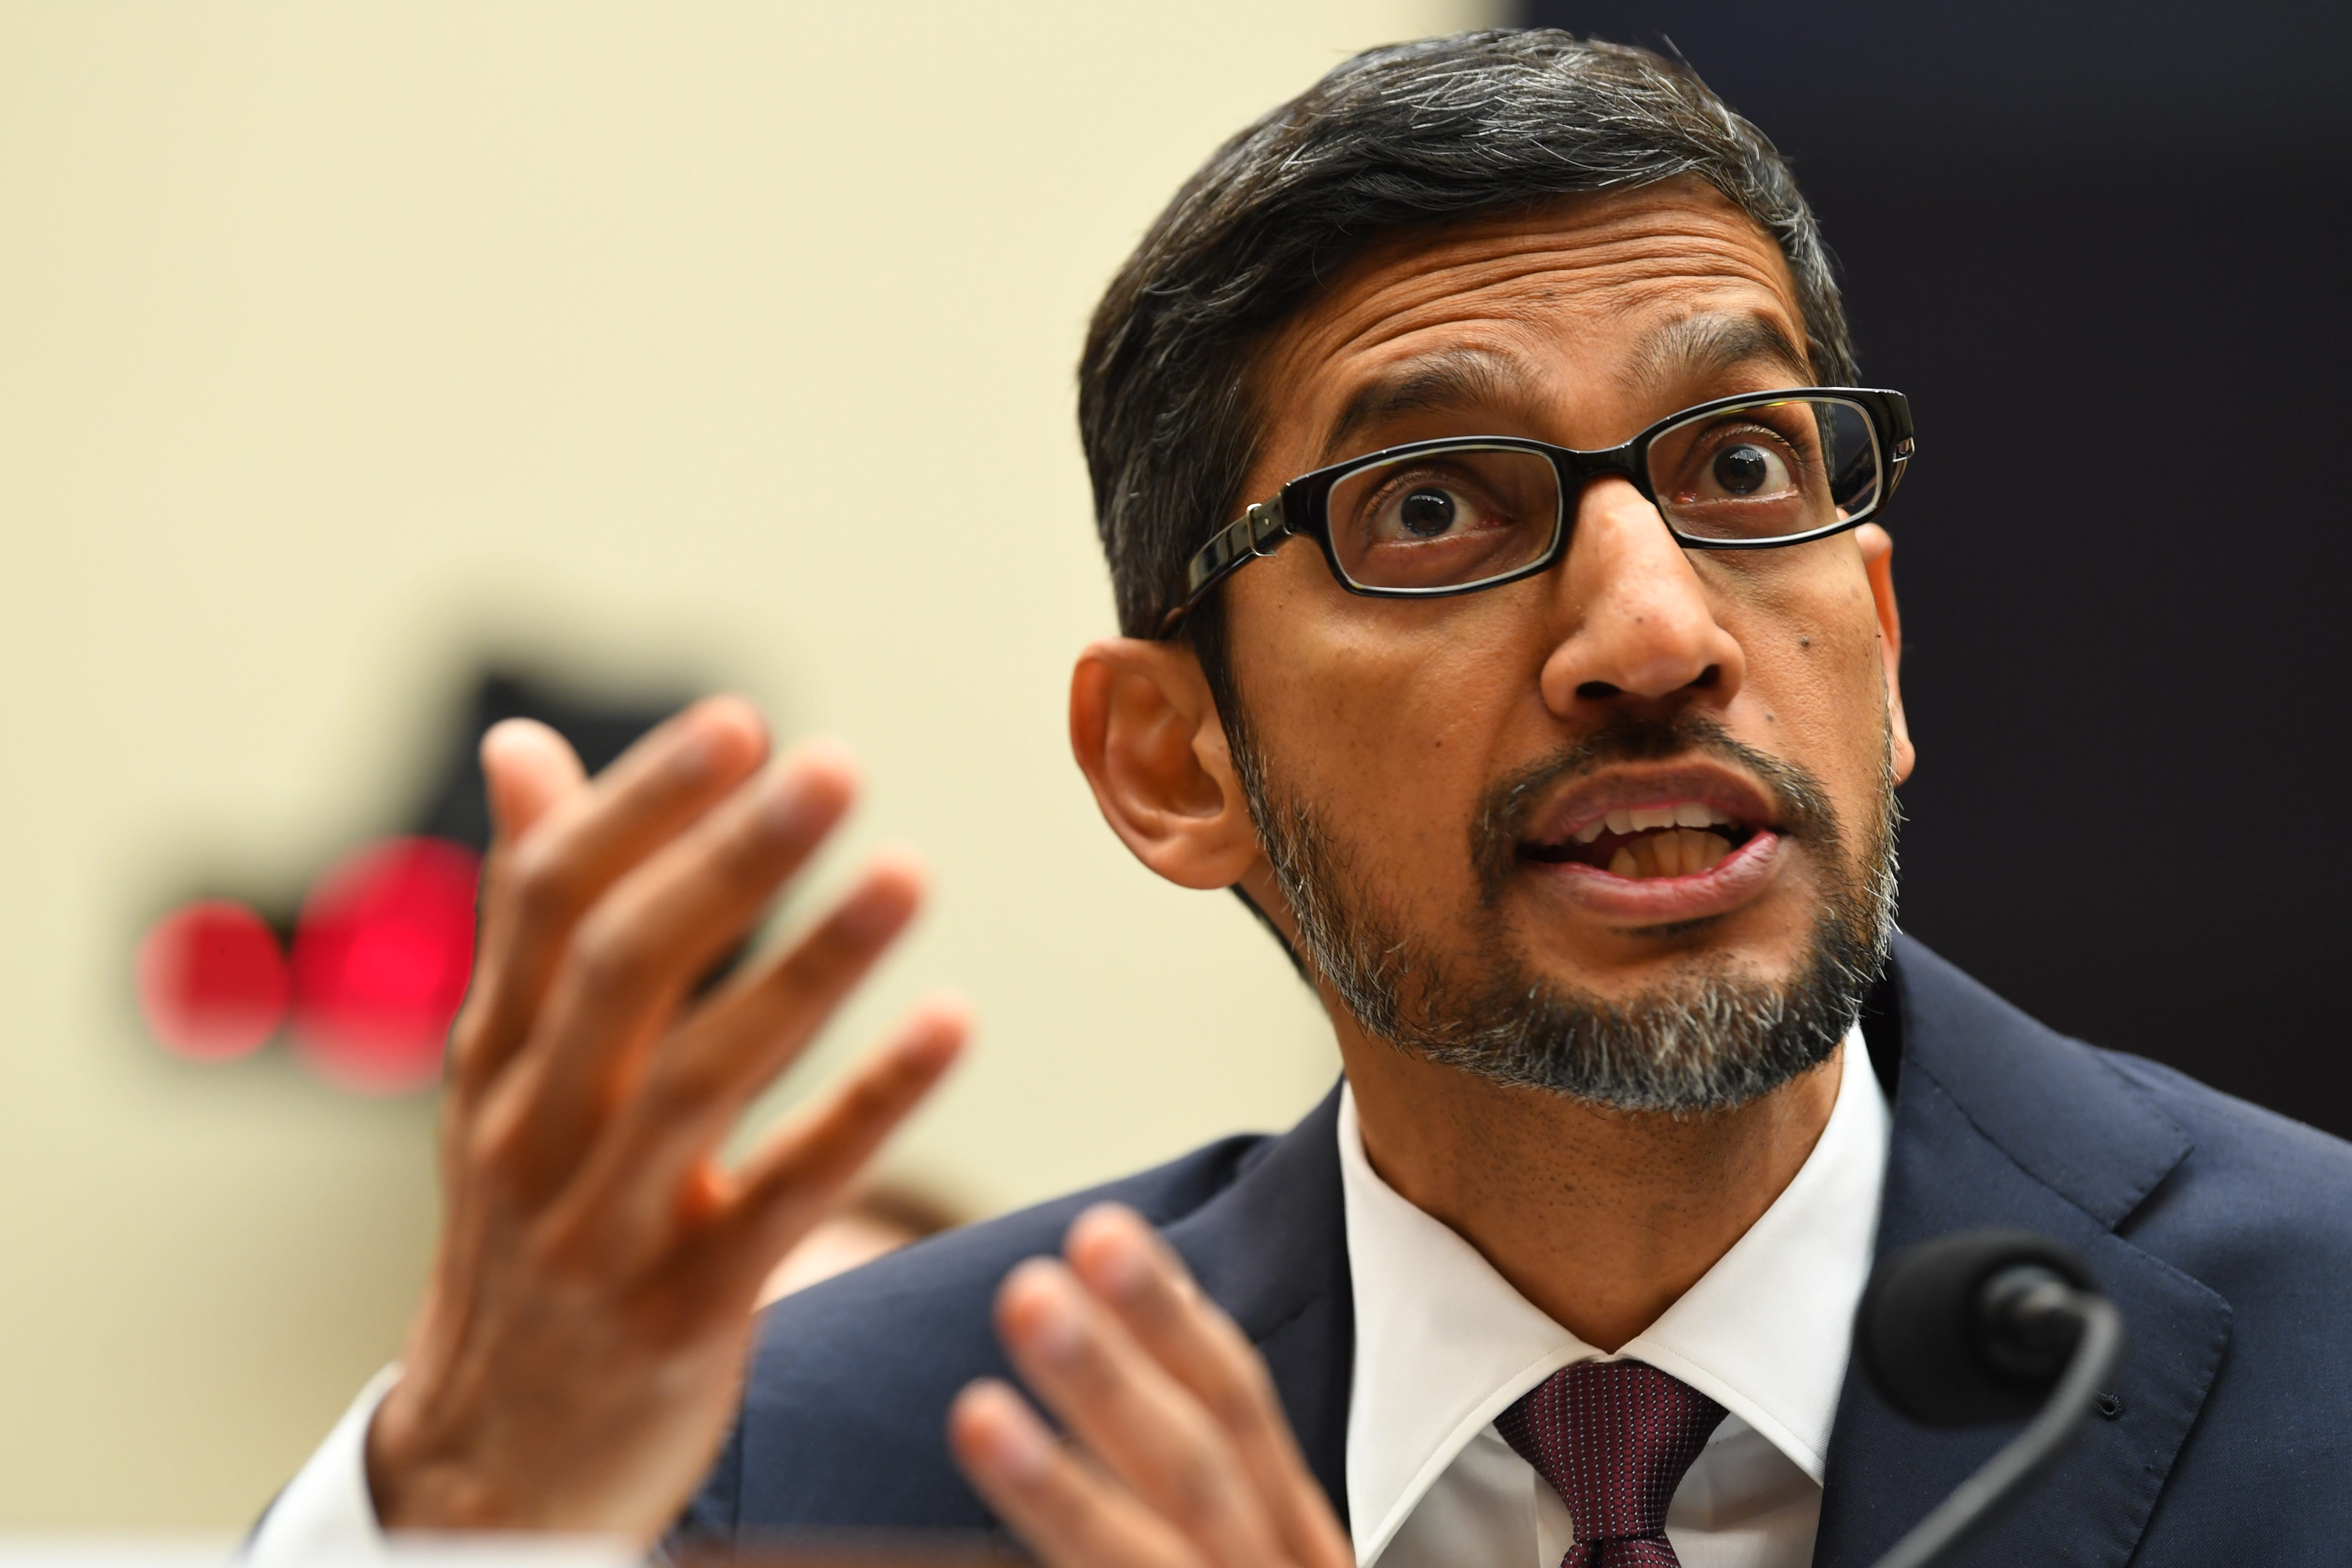 'Offensive and embarrassing': Senators struggle to pronounce Google CEO Sundar Pichai's name correctly